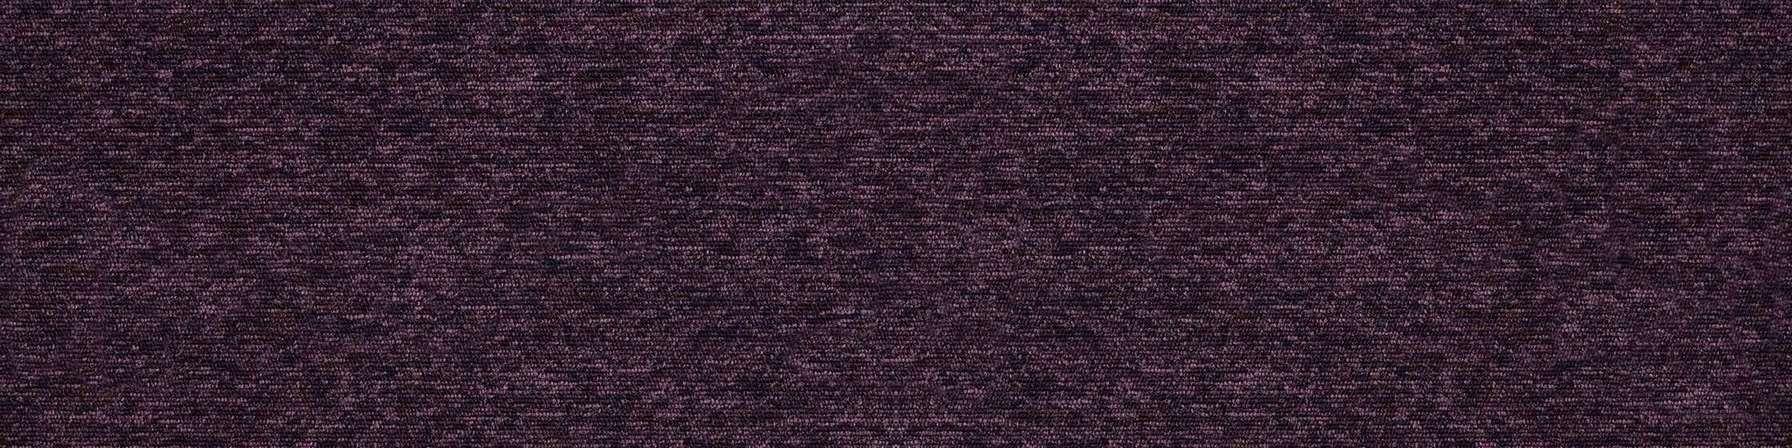 tivoli 21112 marie galante purple carpet plank